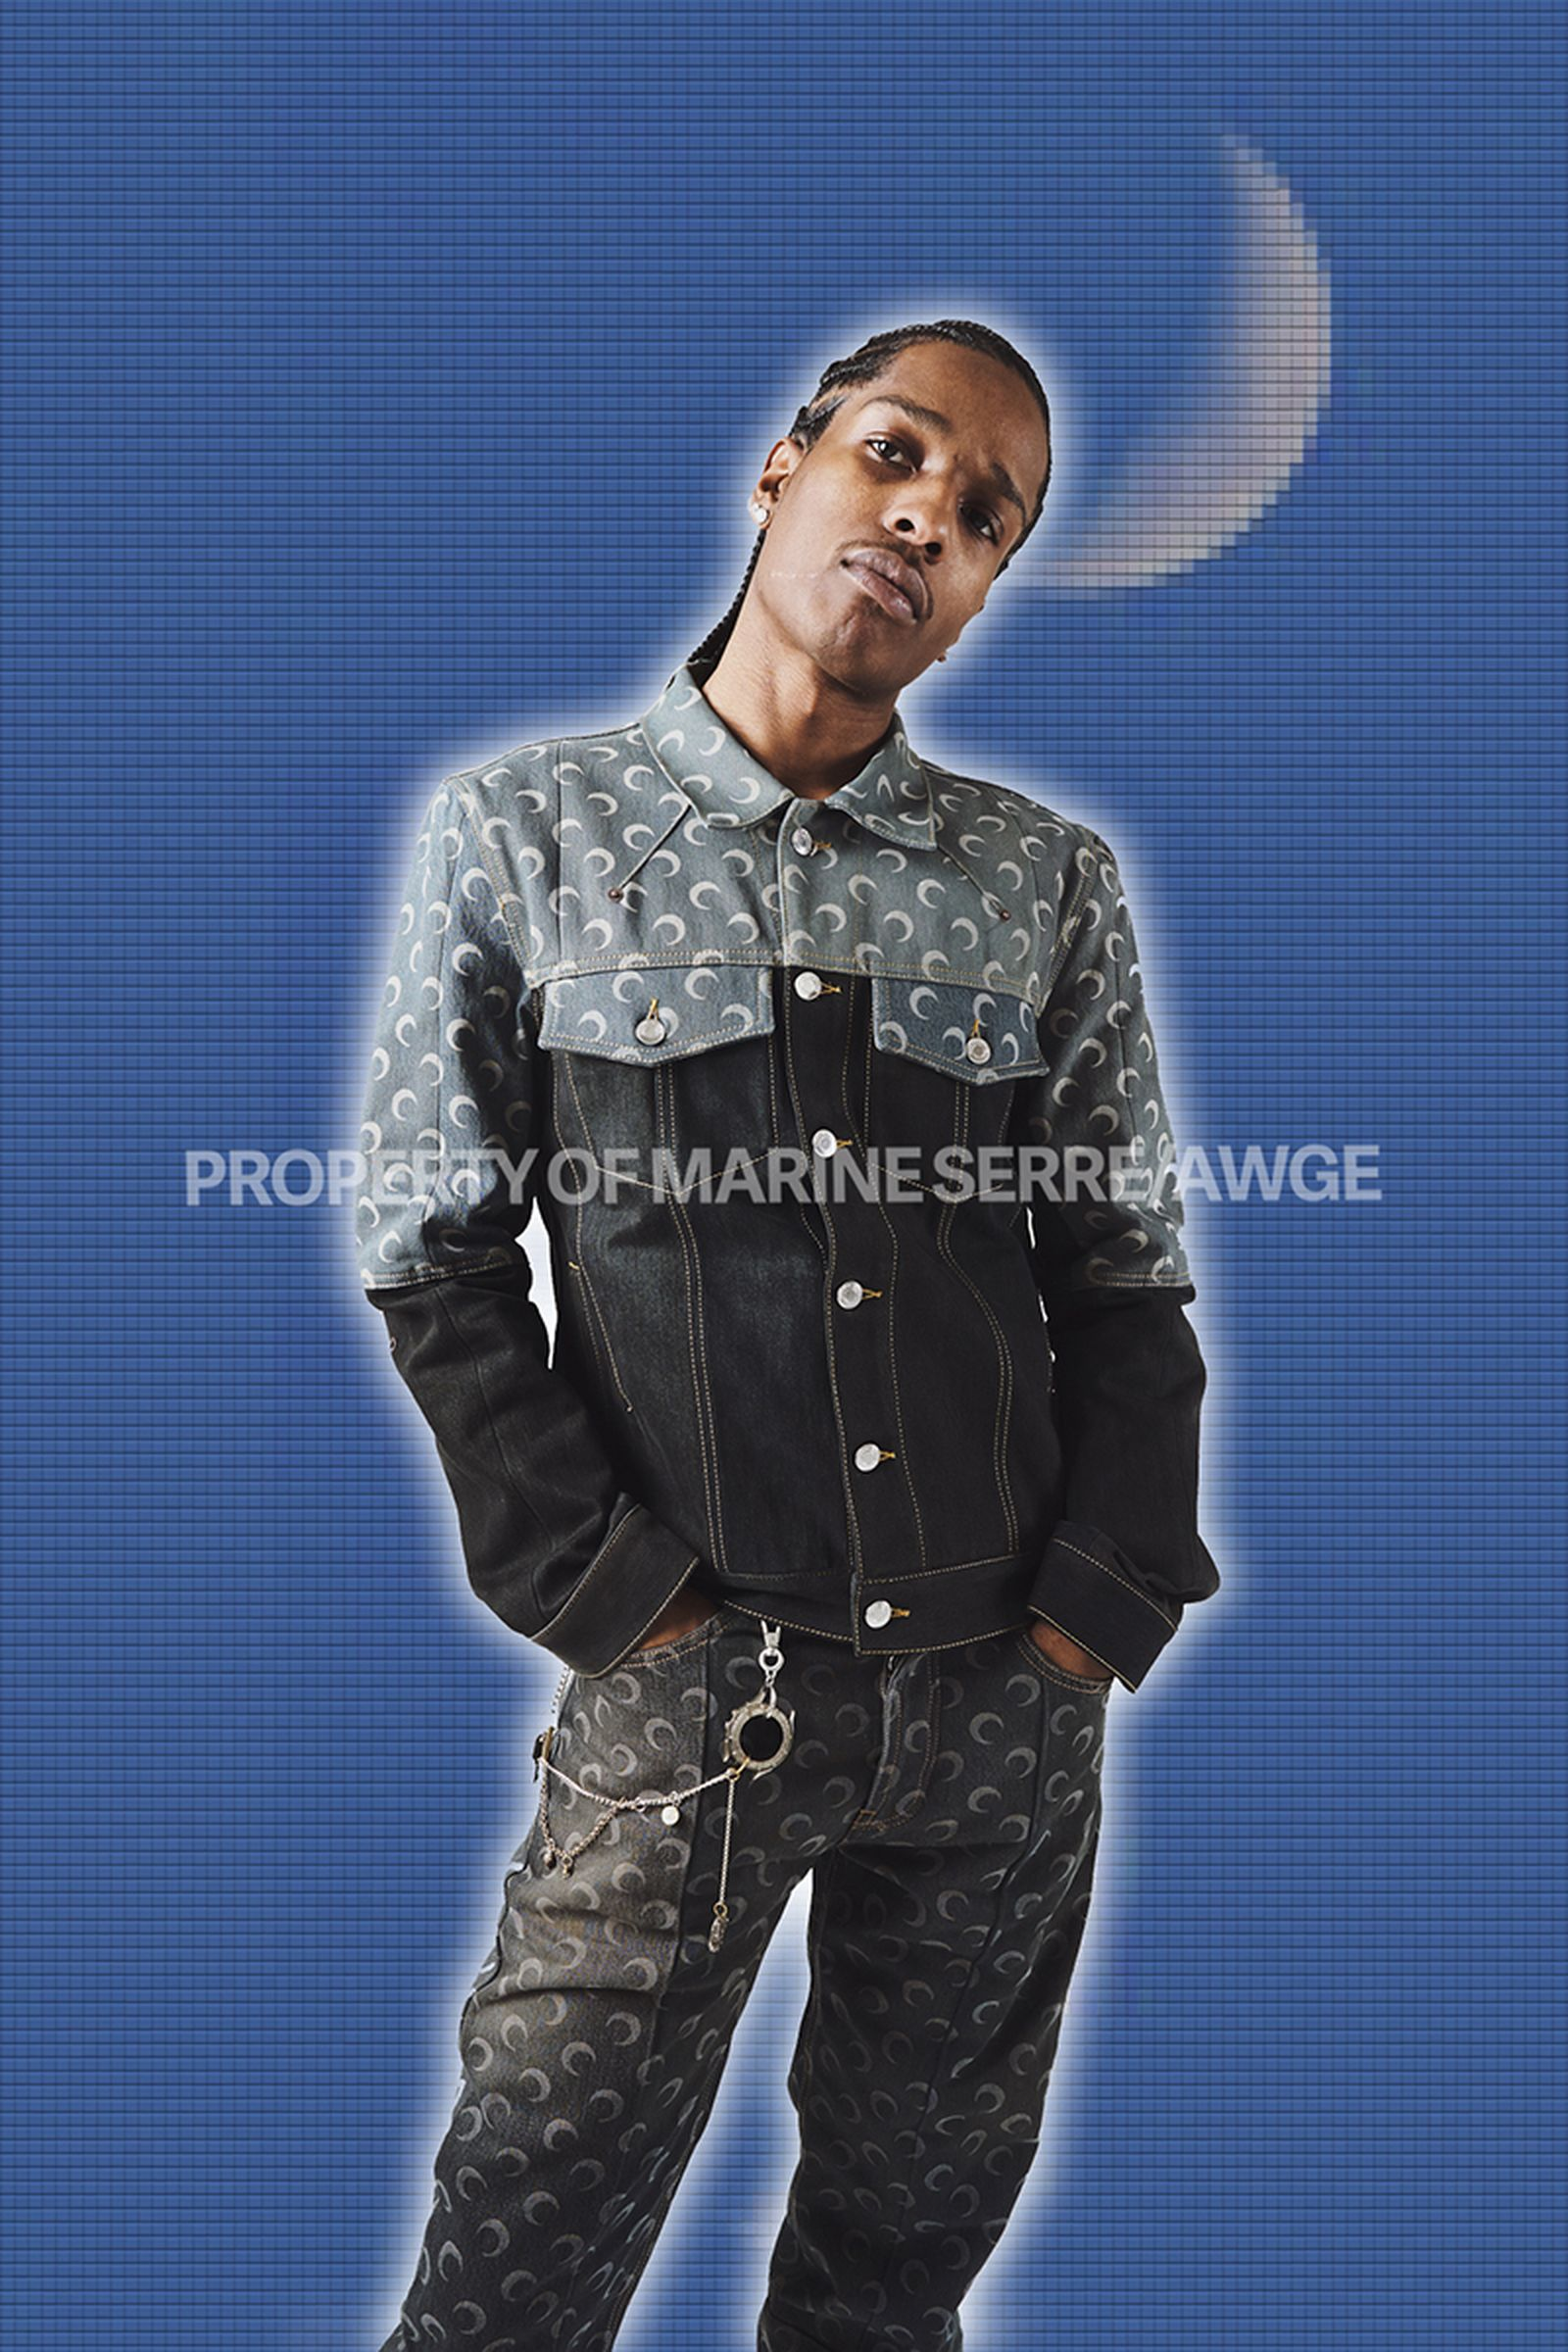 marine-serre-awge-regenerated-collection-01